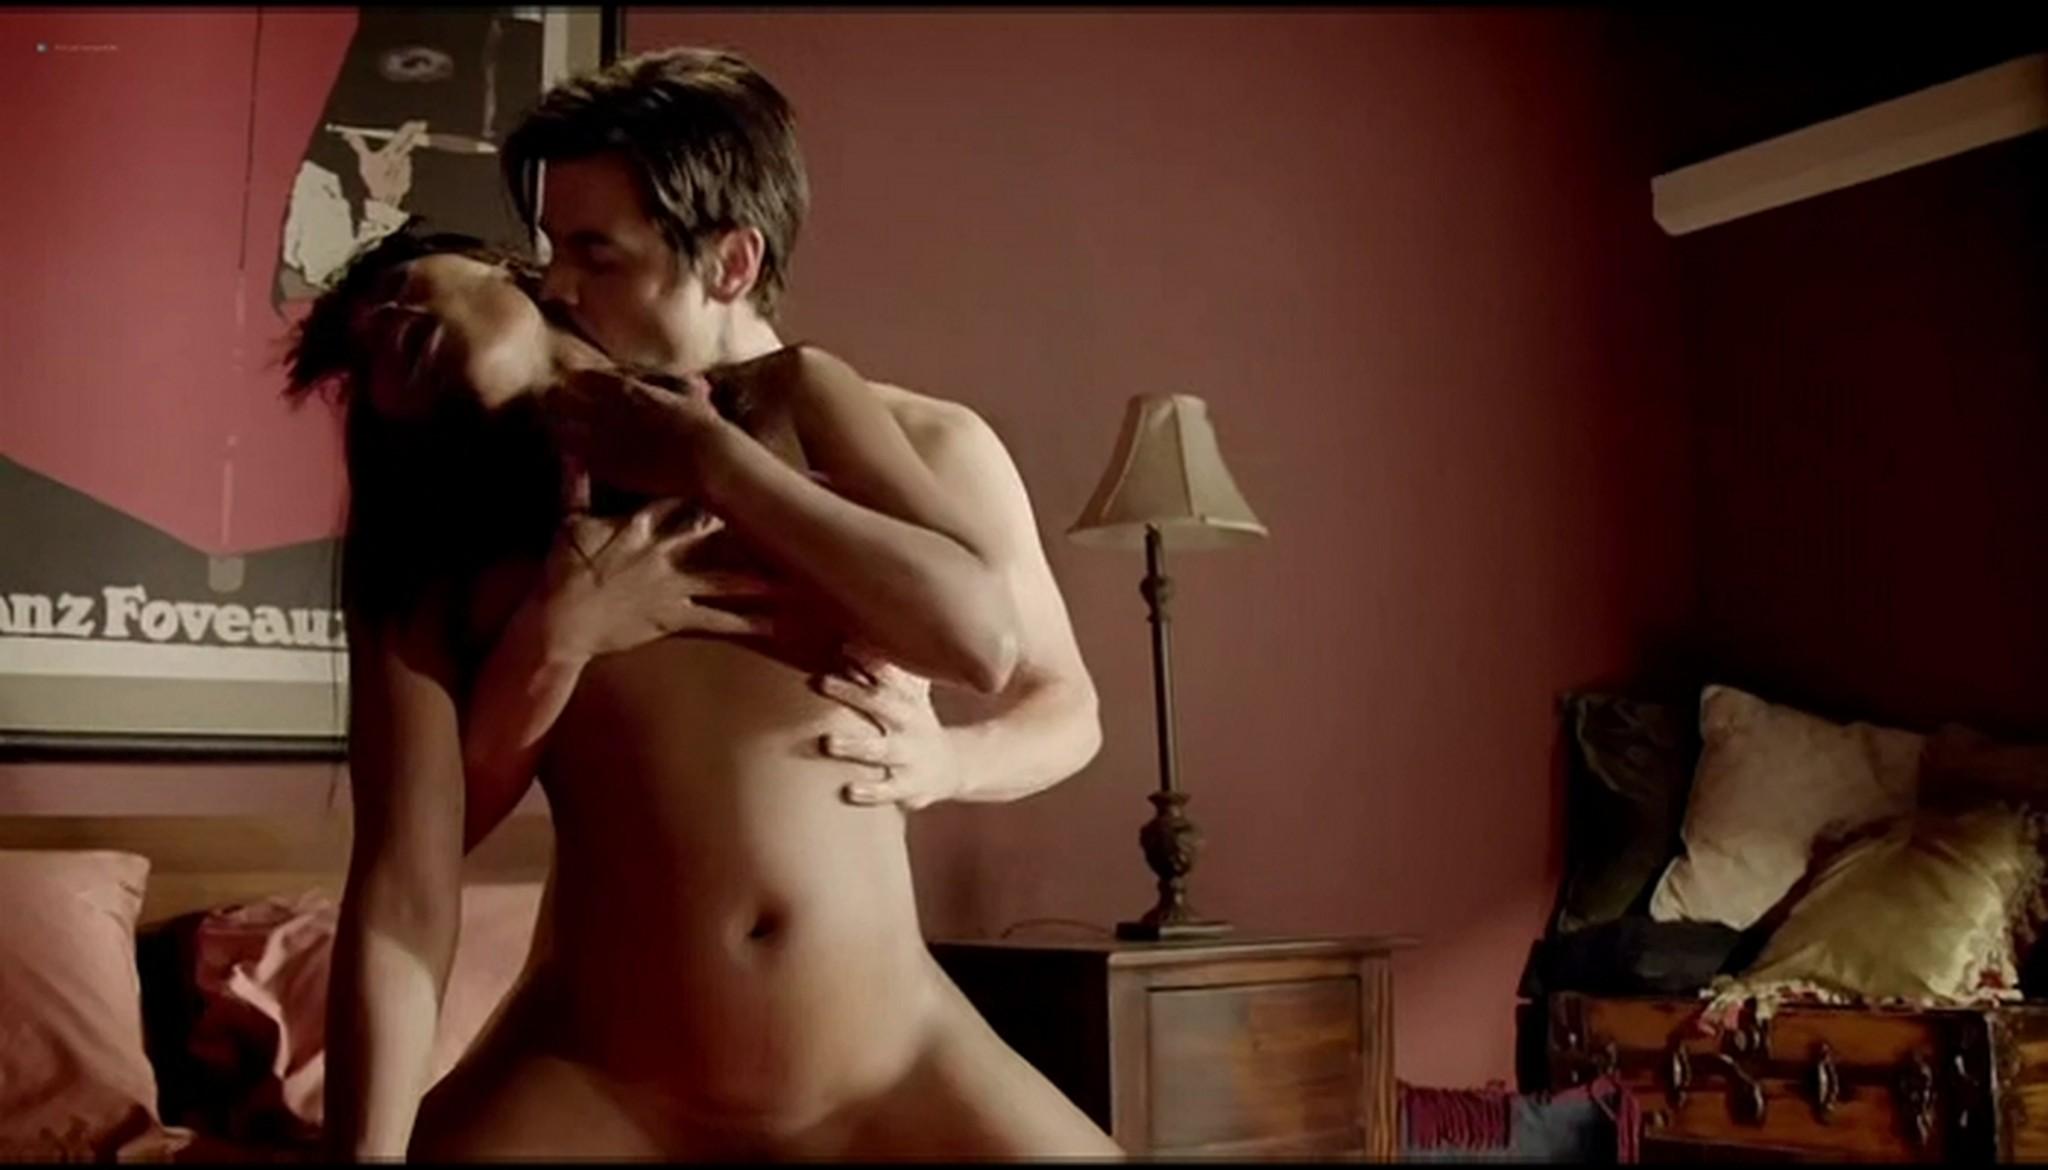 Gigi Feshold nude sex Scheana Shay, Tiffany Tynes nude hot sex too - Femme Fatales (2012) (13)